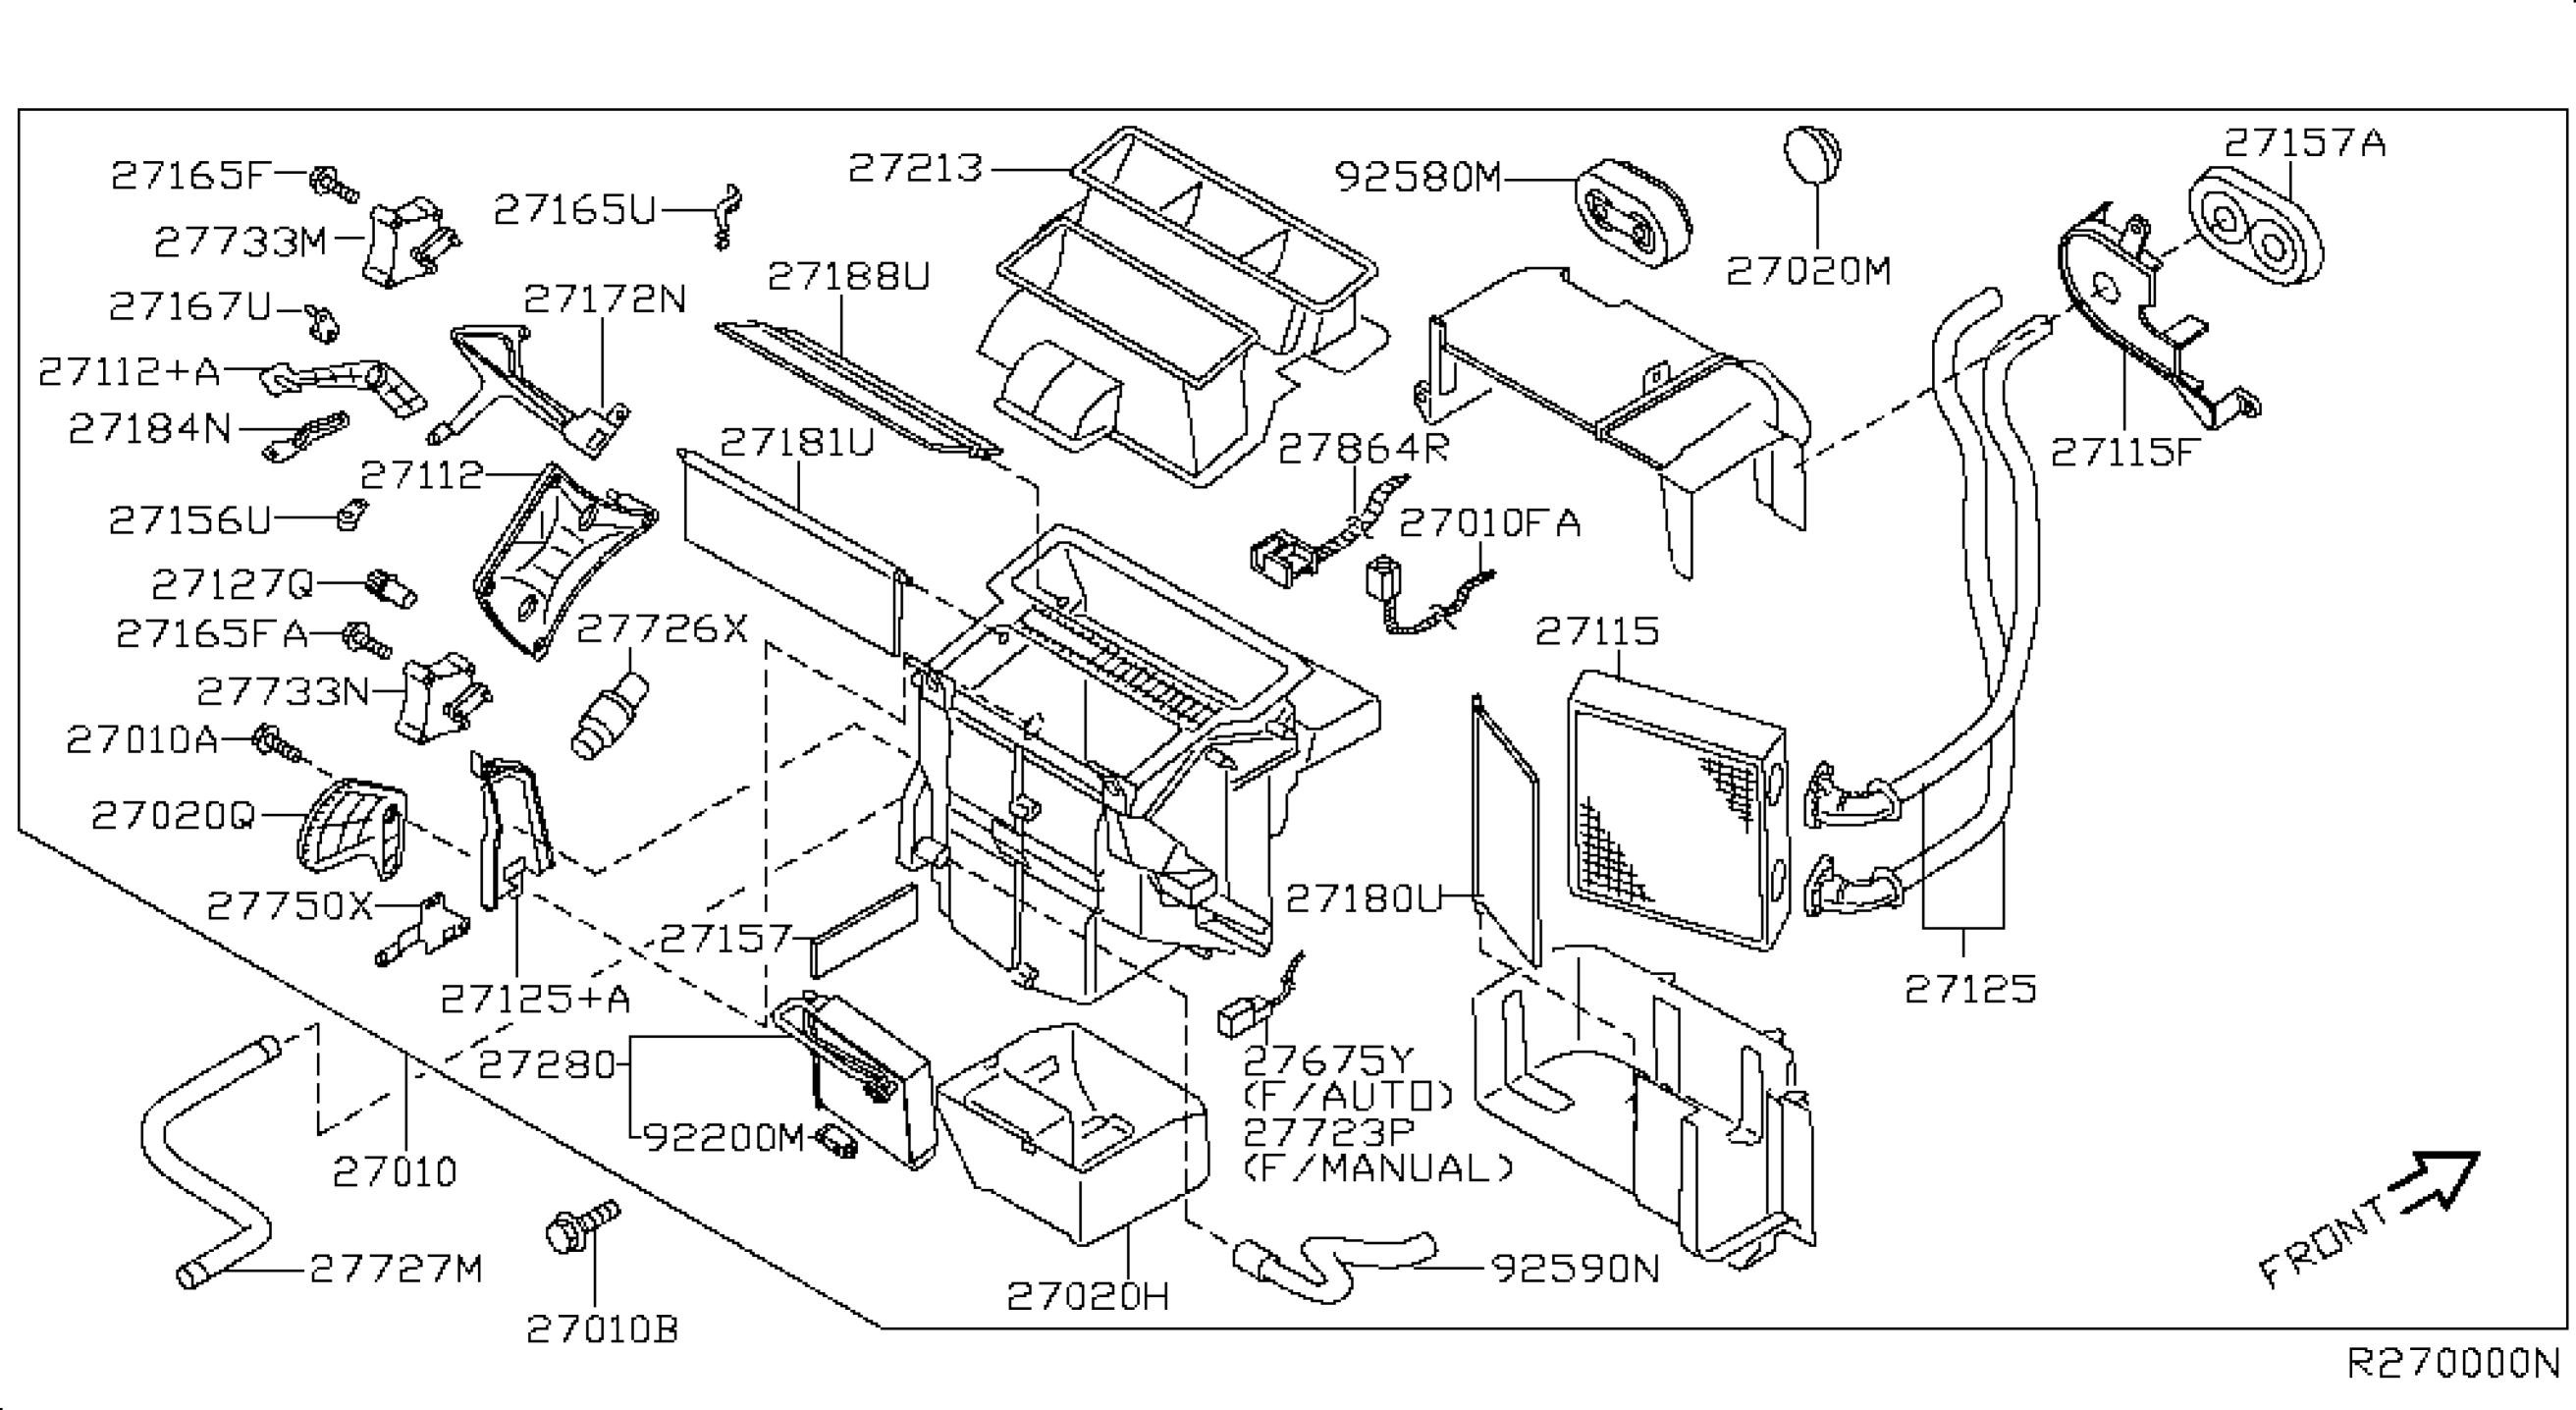 Wiring Diagram PDF: 2003 350z Engine Diagram